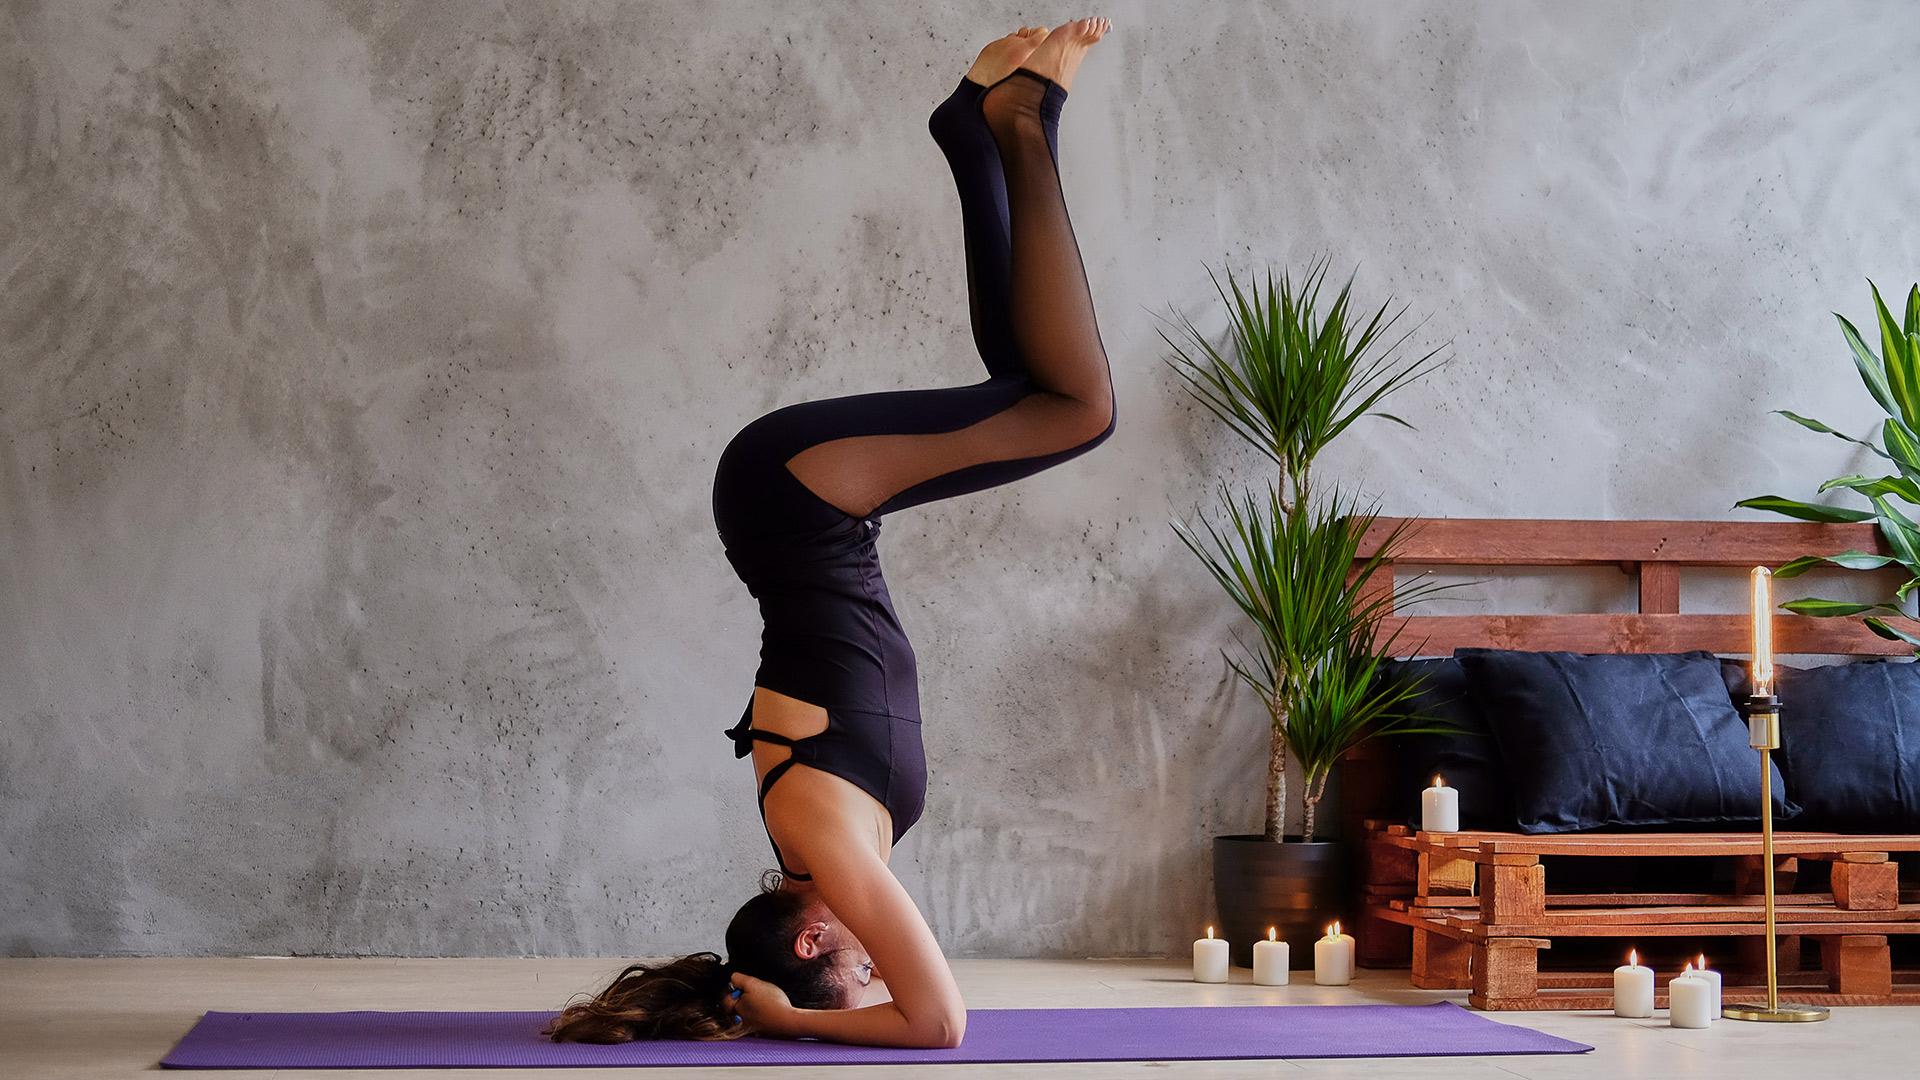 female-doing-yoga-pilates-GXUCQ2R